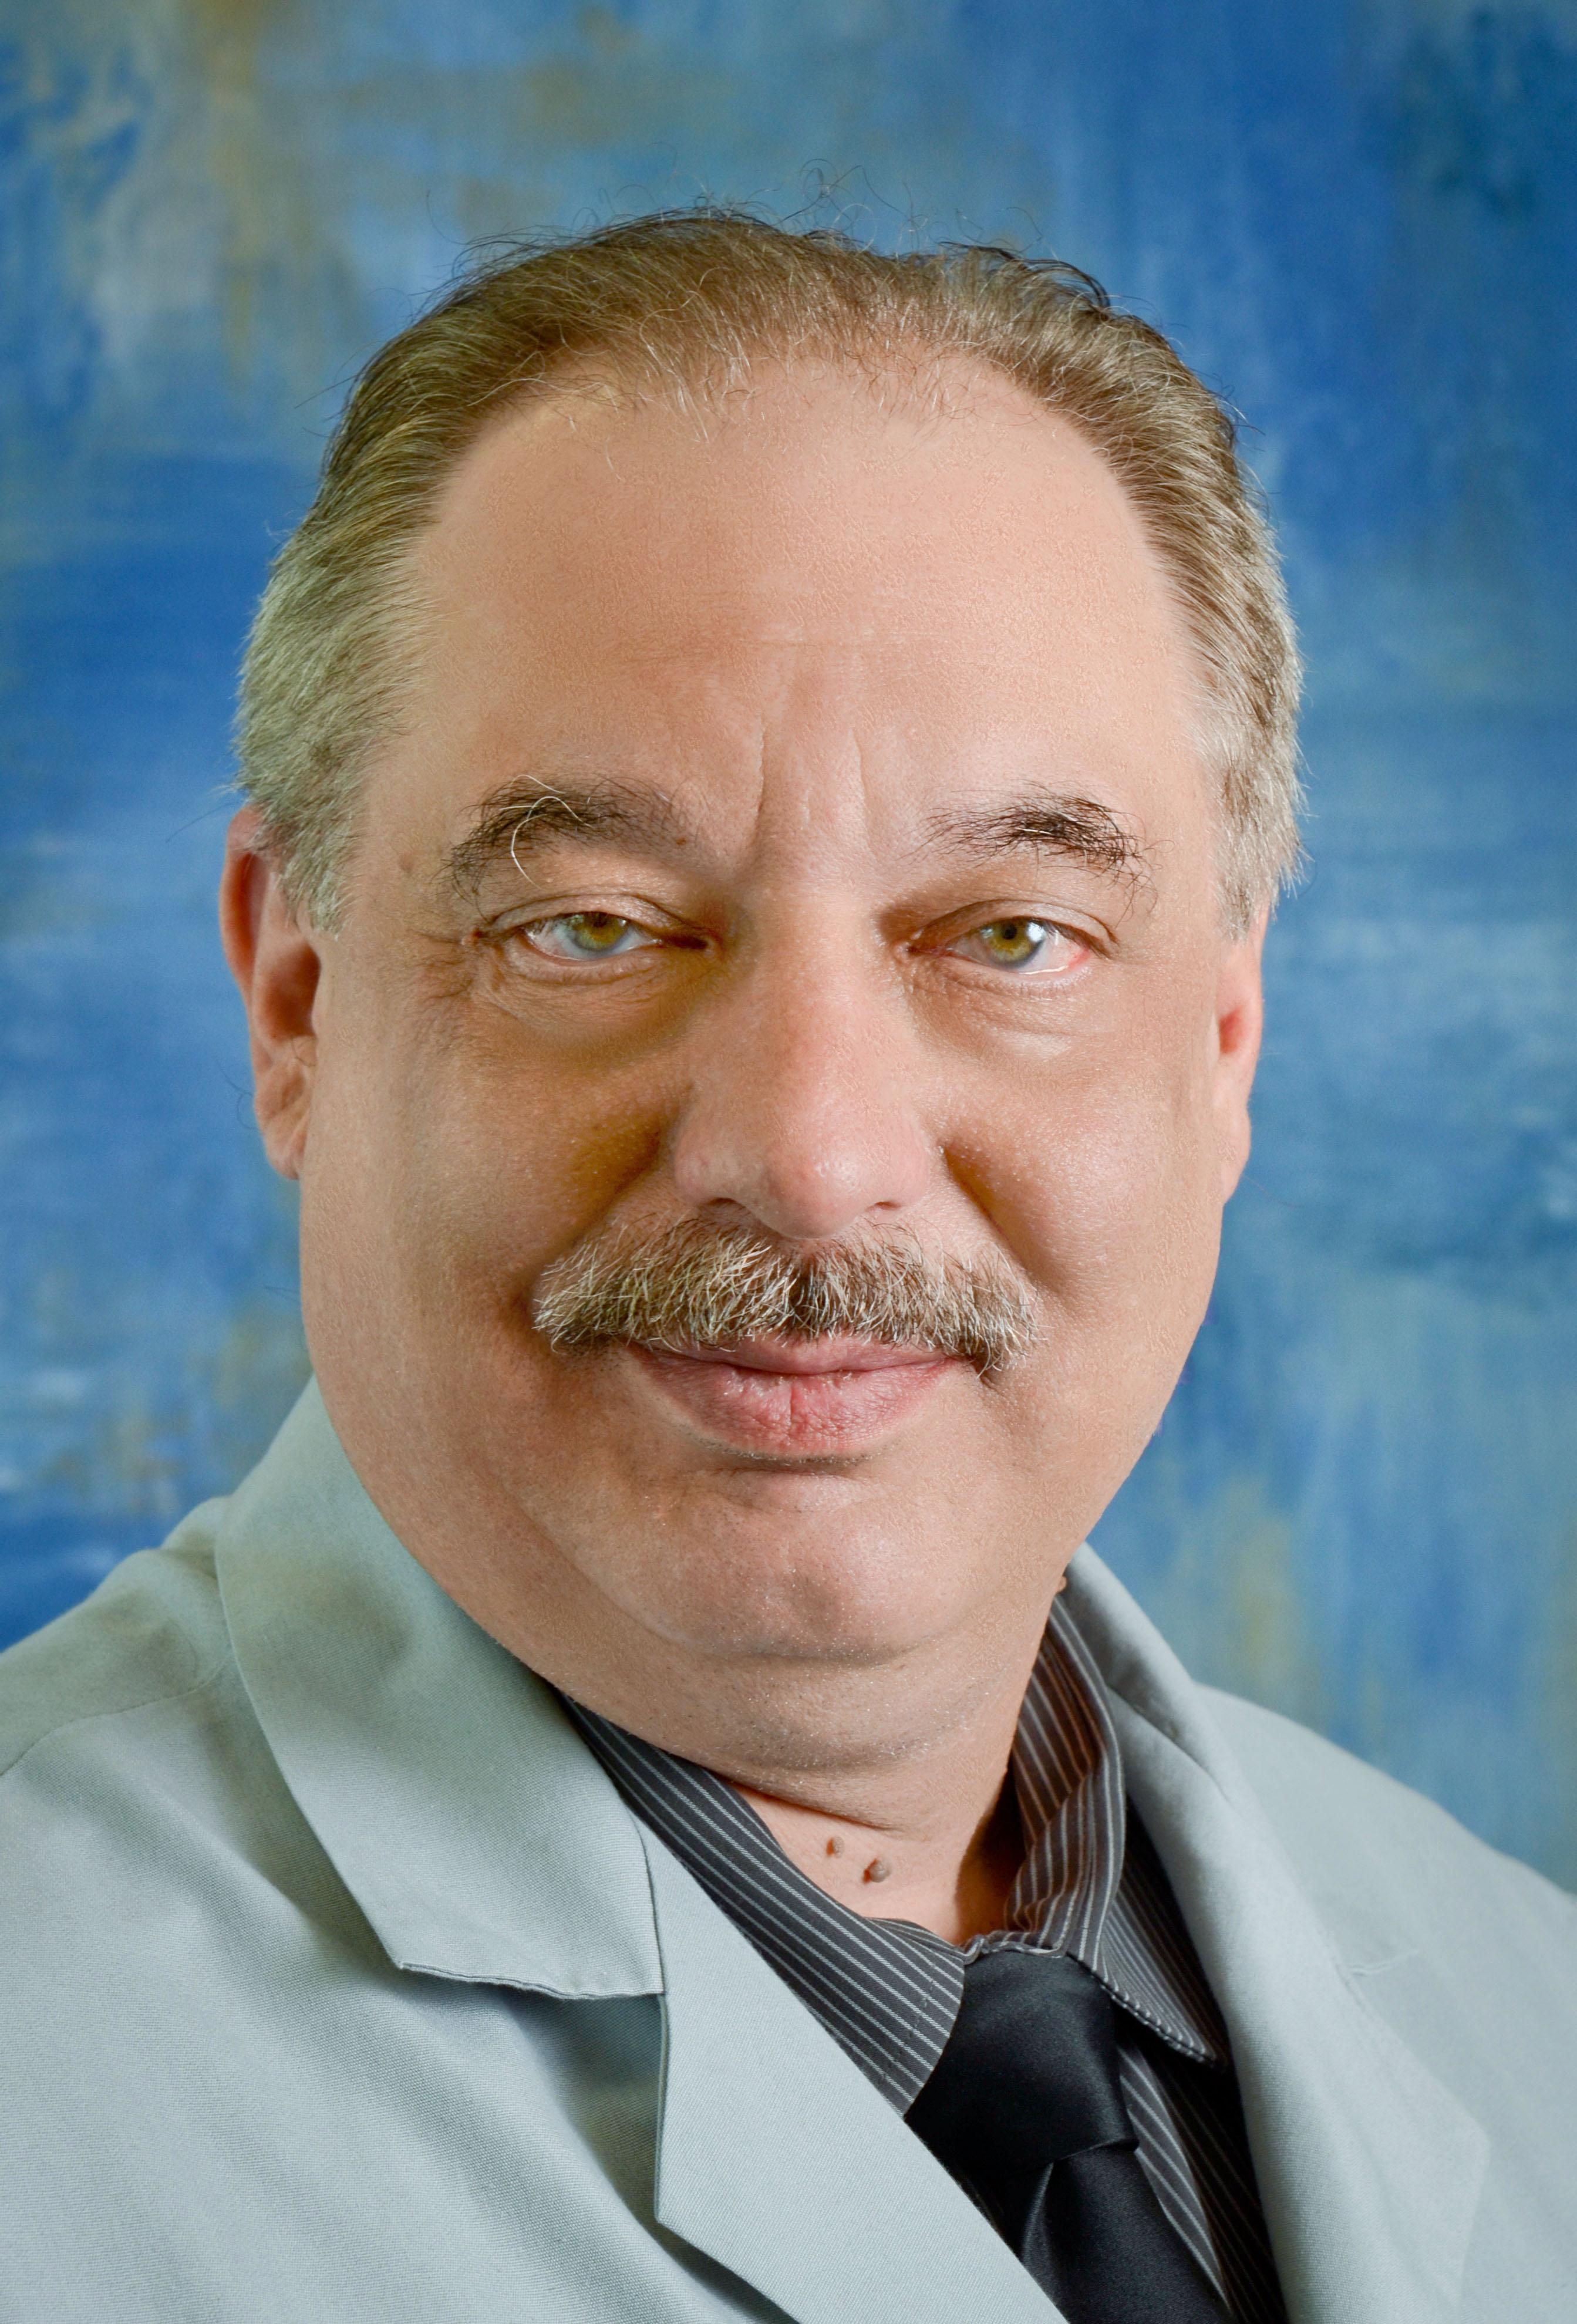 Richard J. Pulla, DPM